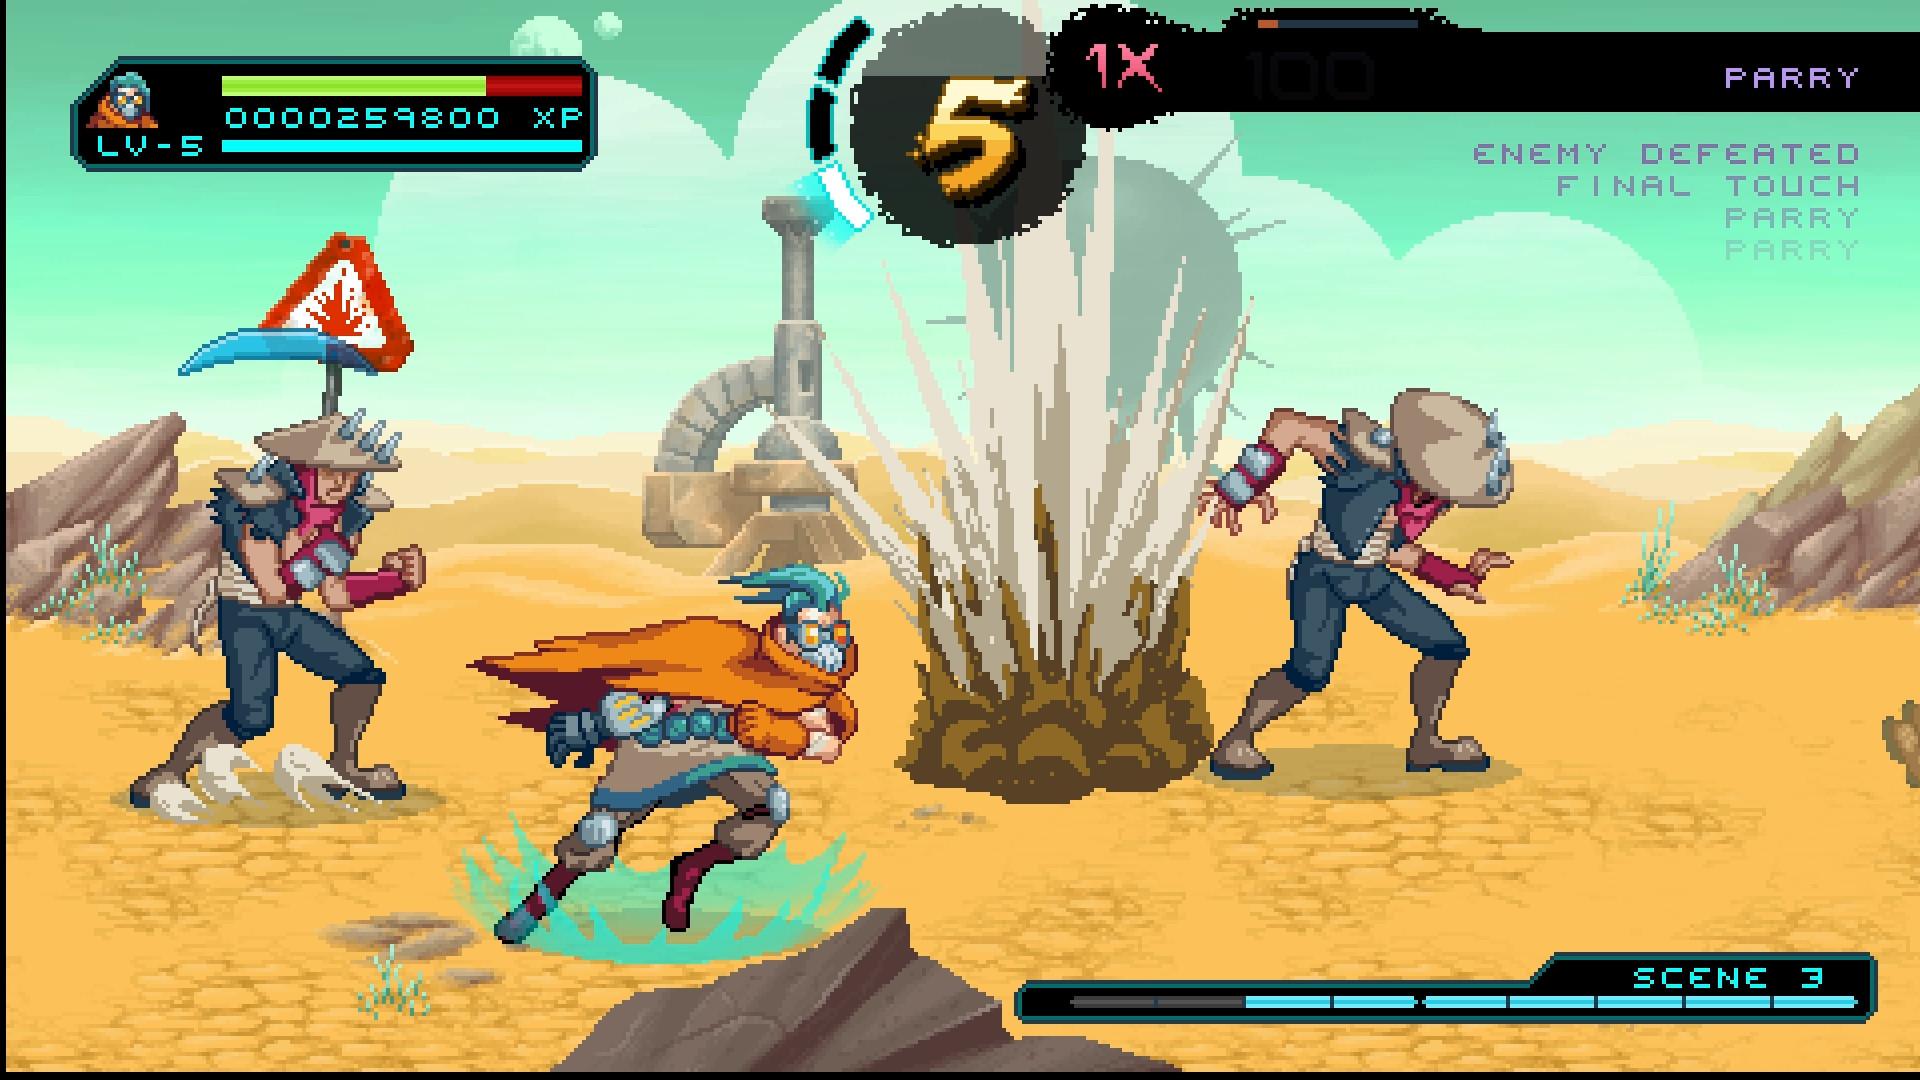 Way of the Passive Fist screenshot